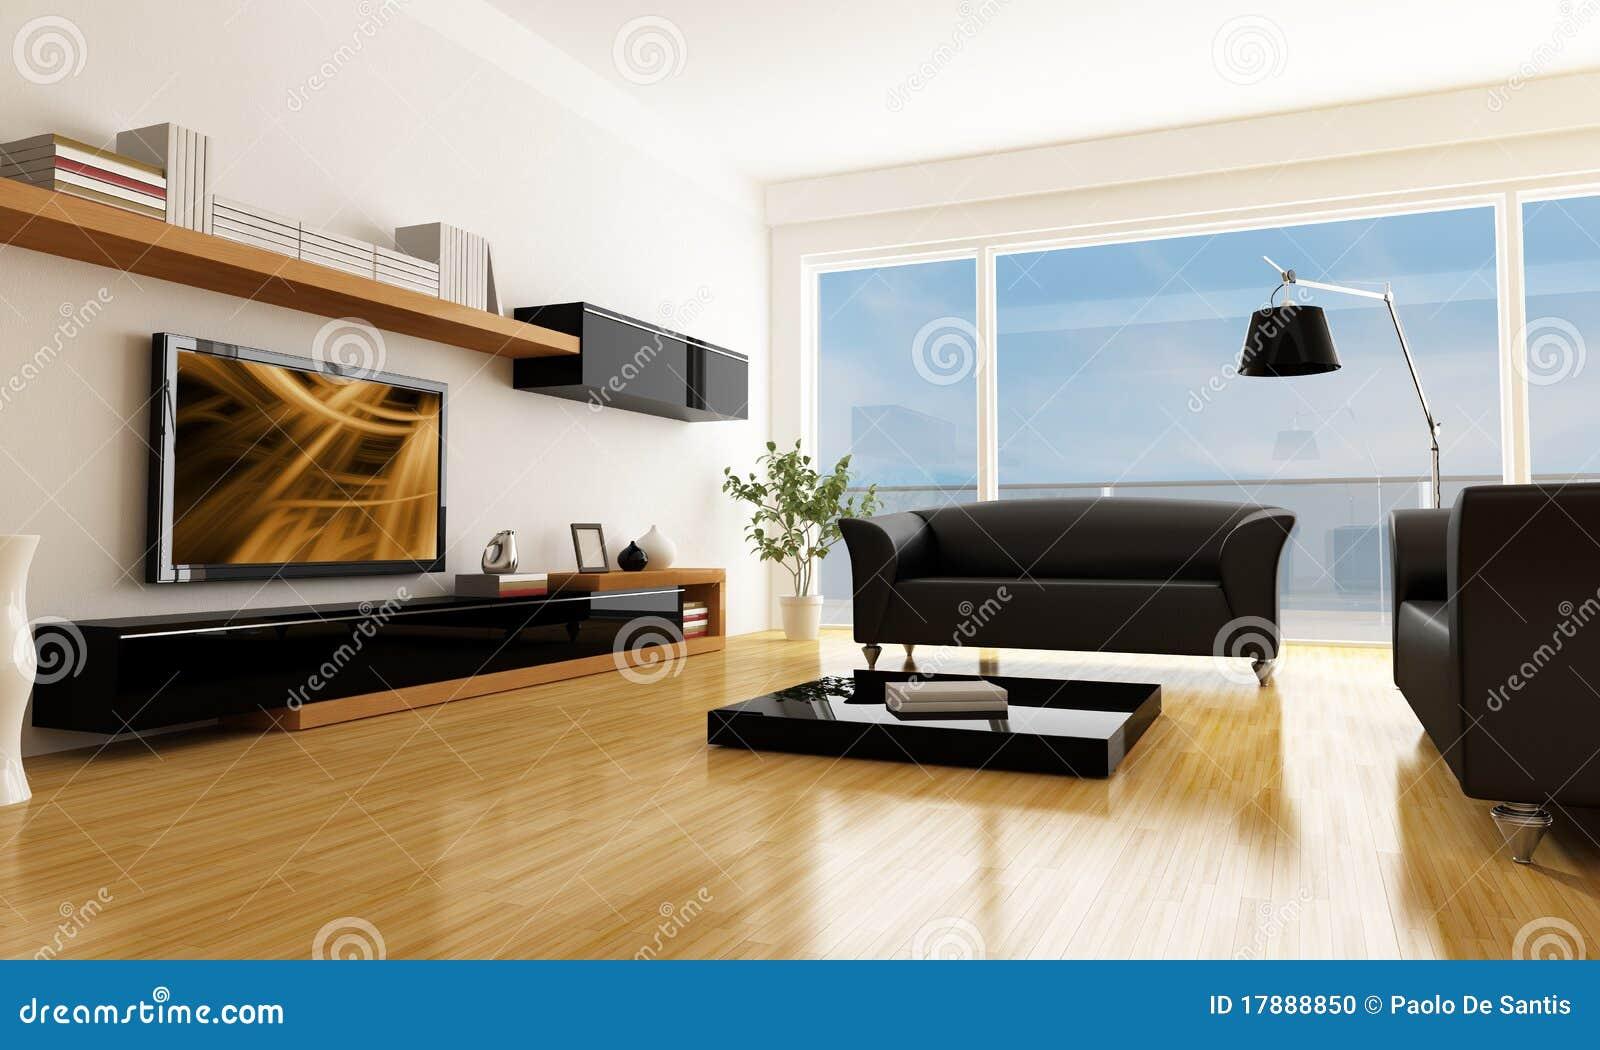 Fotos De Sala De Estar Con Tv ~ Sala De Estar Moderna Foto de archivo  Imagen 17888850